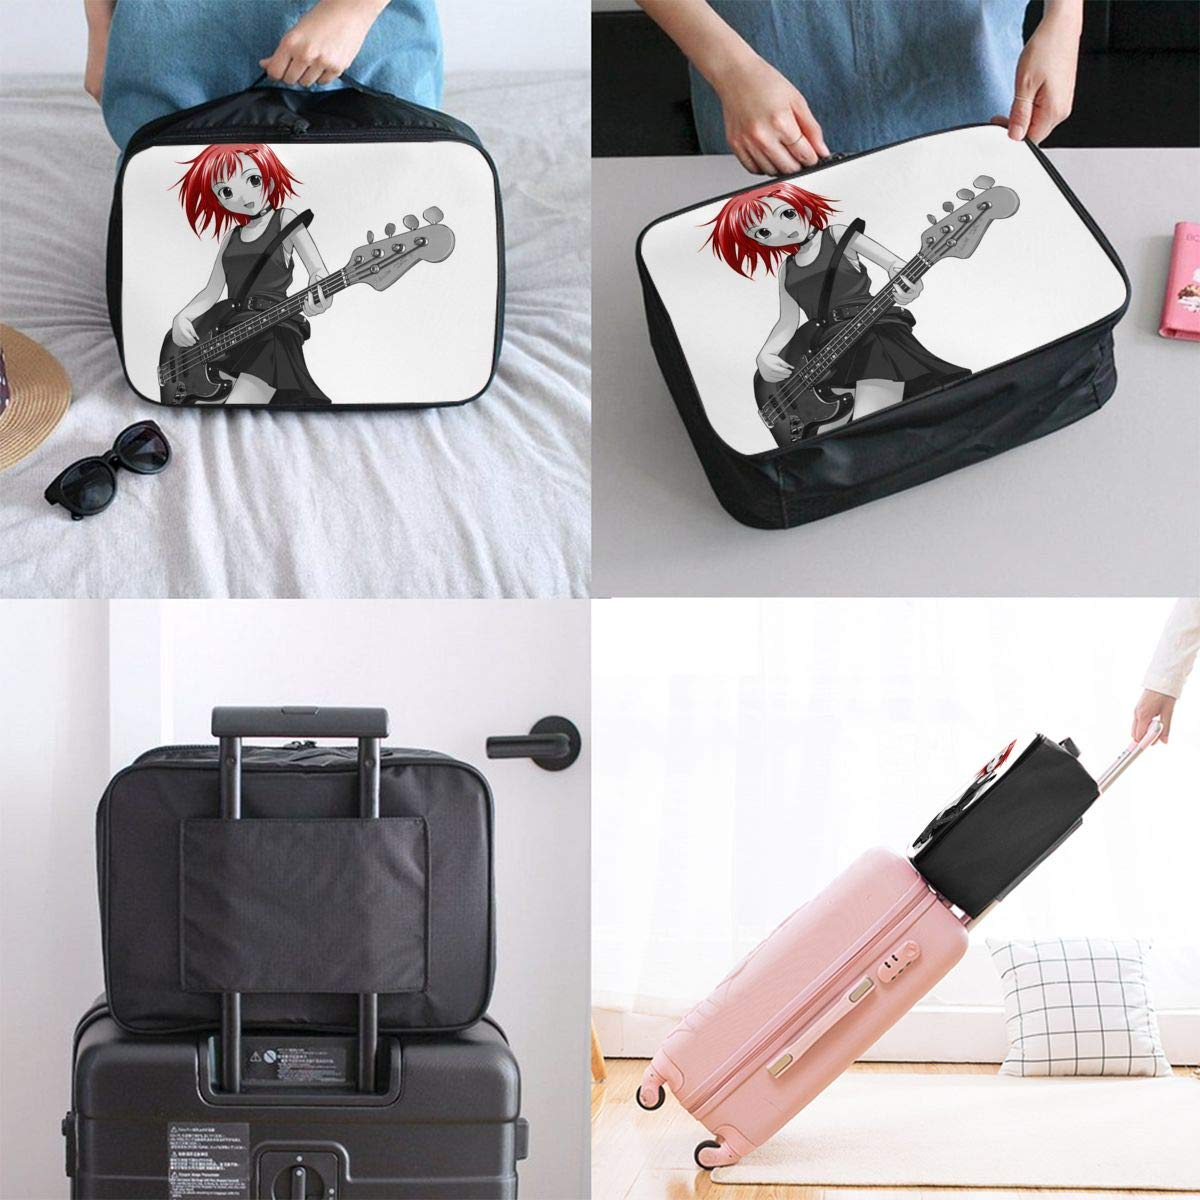 Girl Guitar Original Anime Red Hair Customize Casual Portable Travel Bag Suitcase Storage Bag Luggage Packing Tote Bag Trolley Bag